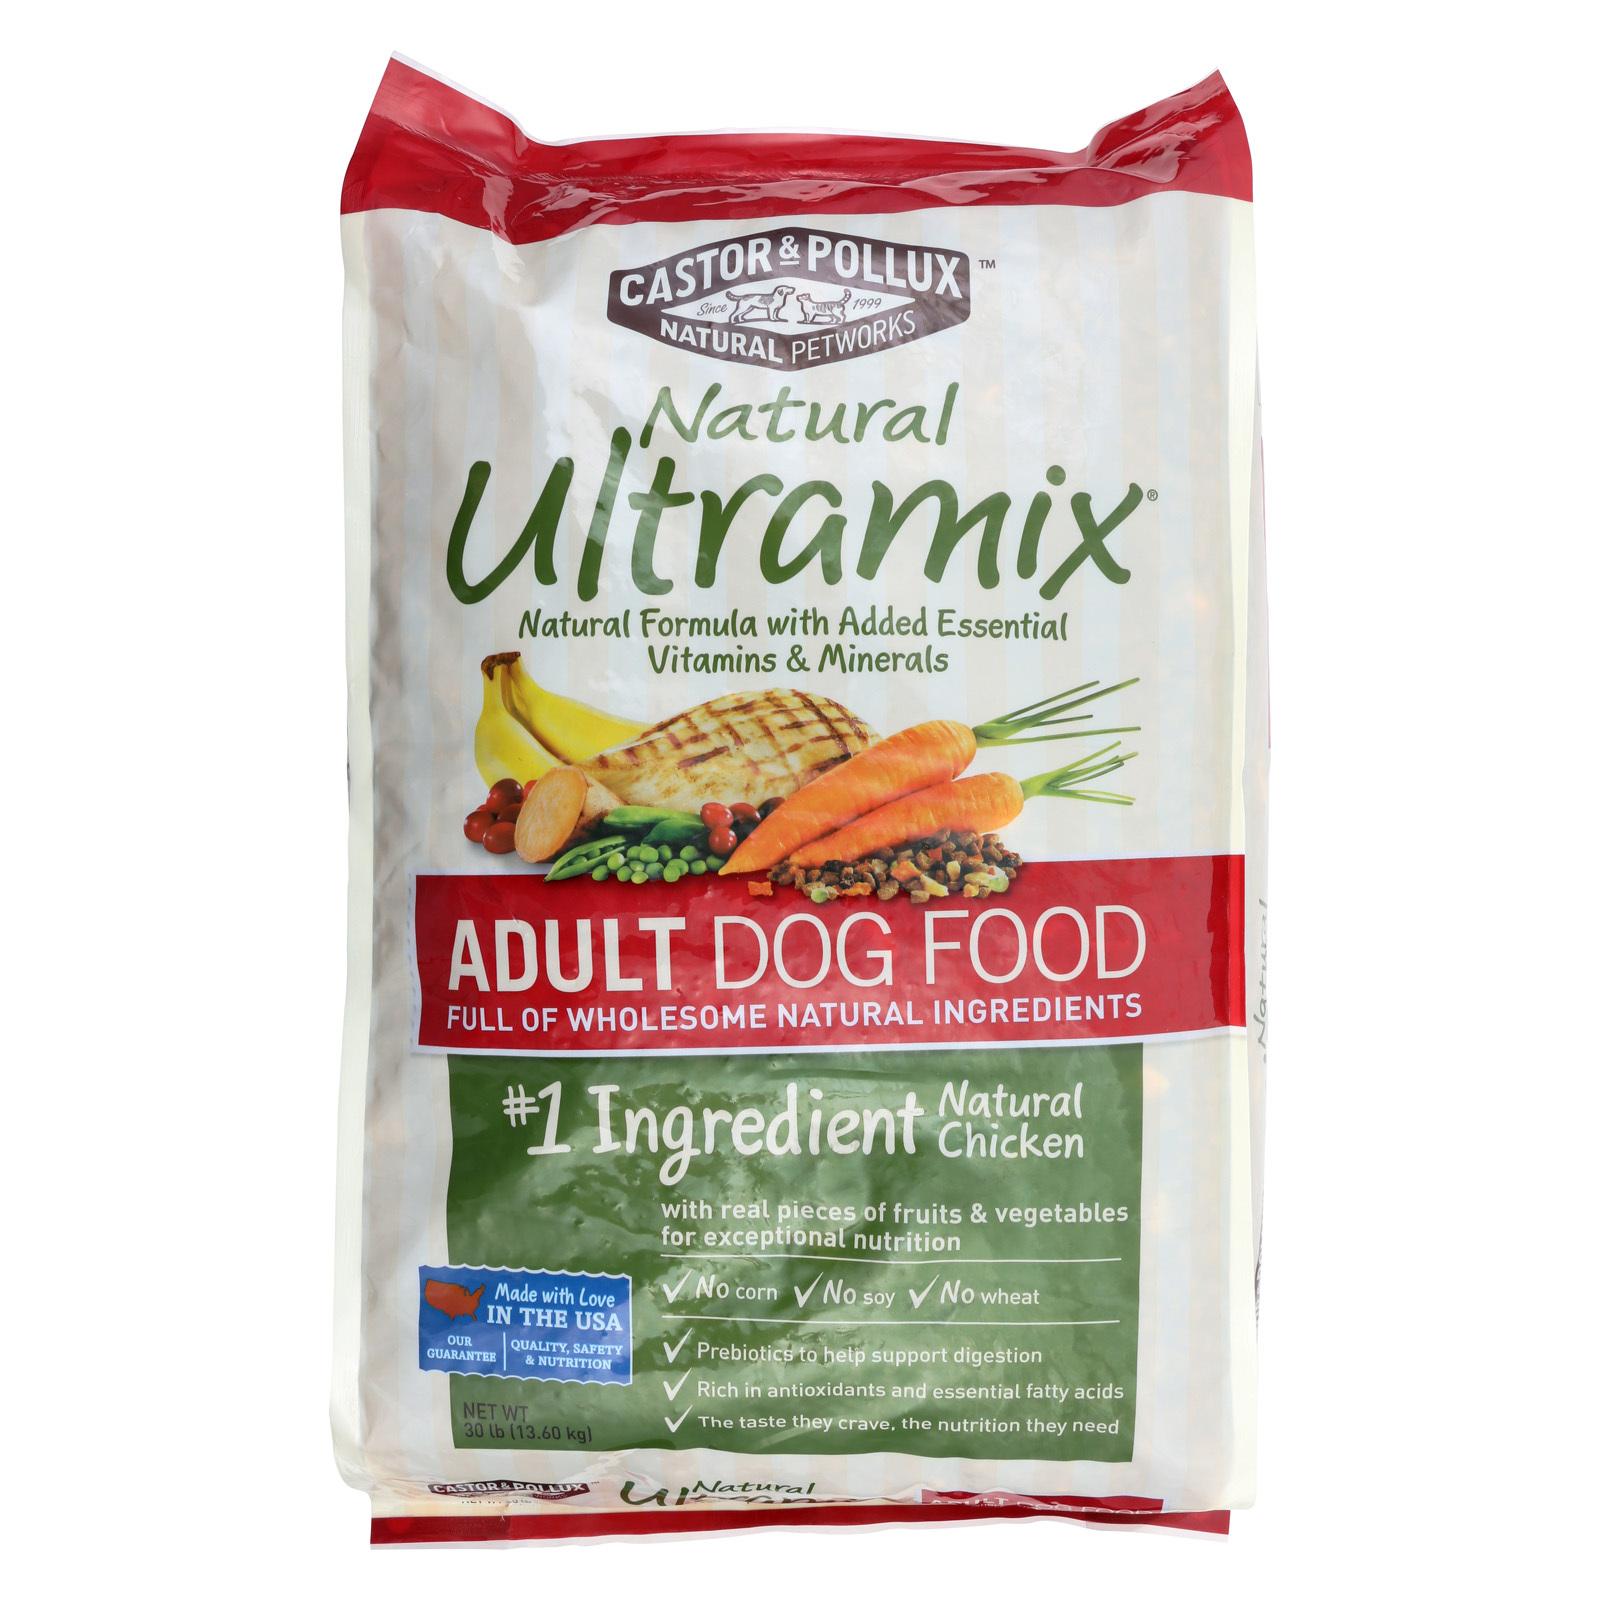 Castor and Pollux Ultra mix Adult Dog Food - 30 lb.